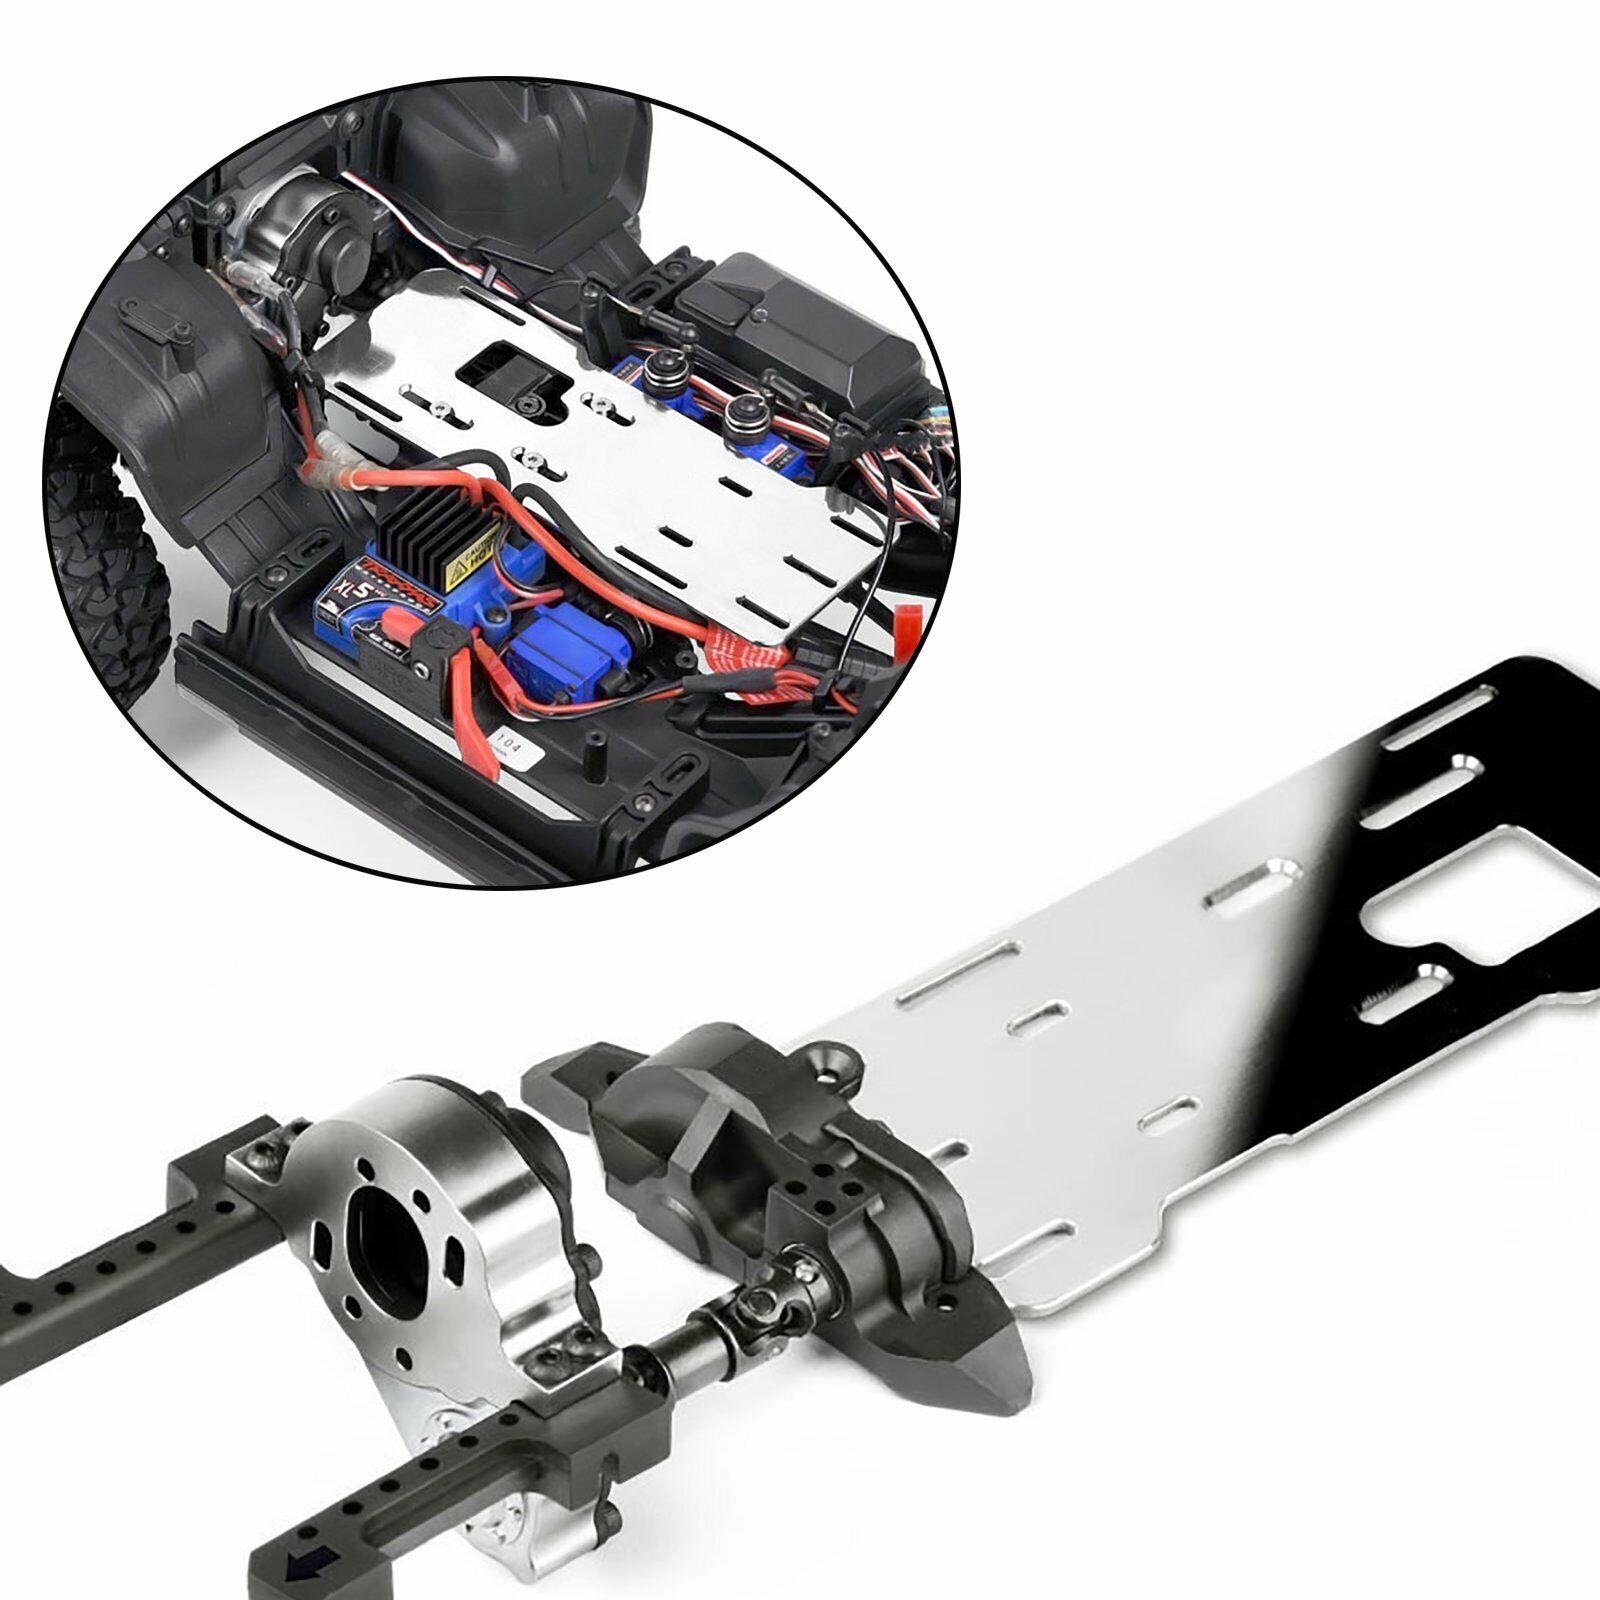 GRC TRX4 G2 Motor pre-Caja De Engranajes Motor Caja De Cambios Montaje Frontal Conjunto Para TRAXXAS TRX-4